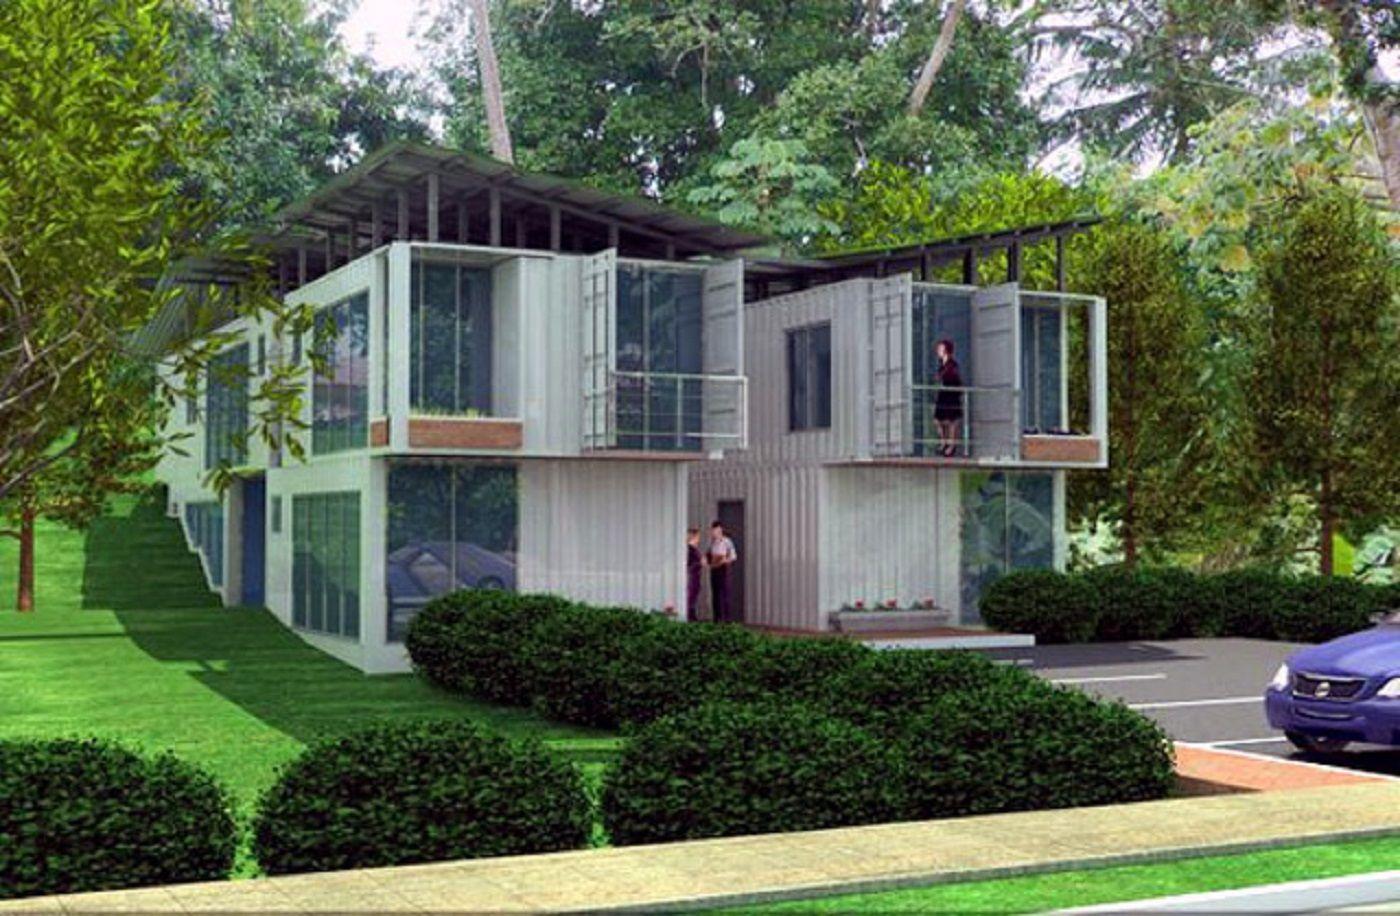 Pin von Elisa Scott auf STORAGE CONTAINER HOUSES AND TINY HOUSES ...